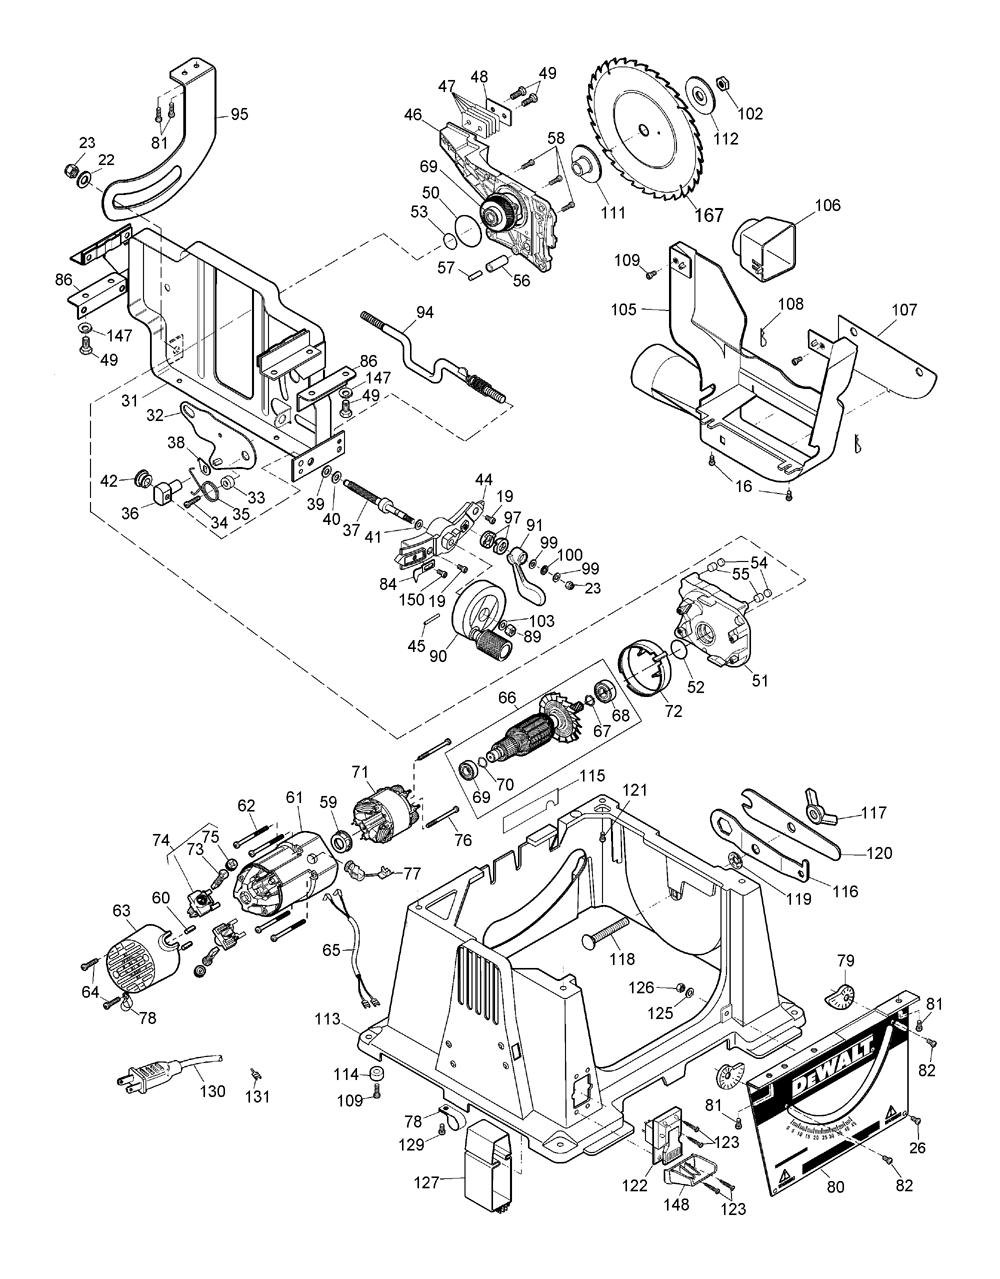 Buy Dewalt DW744 Type-2 10